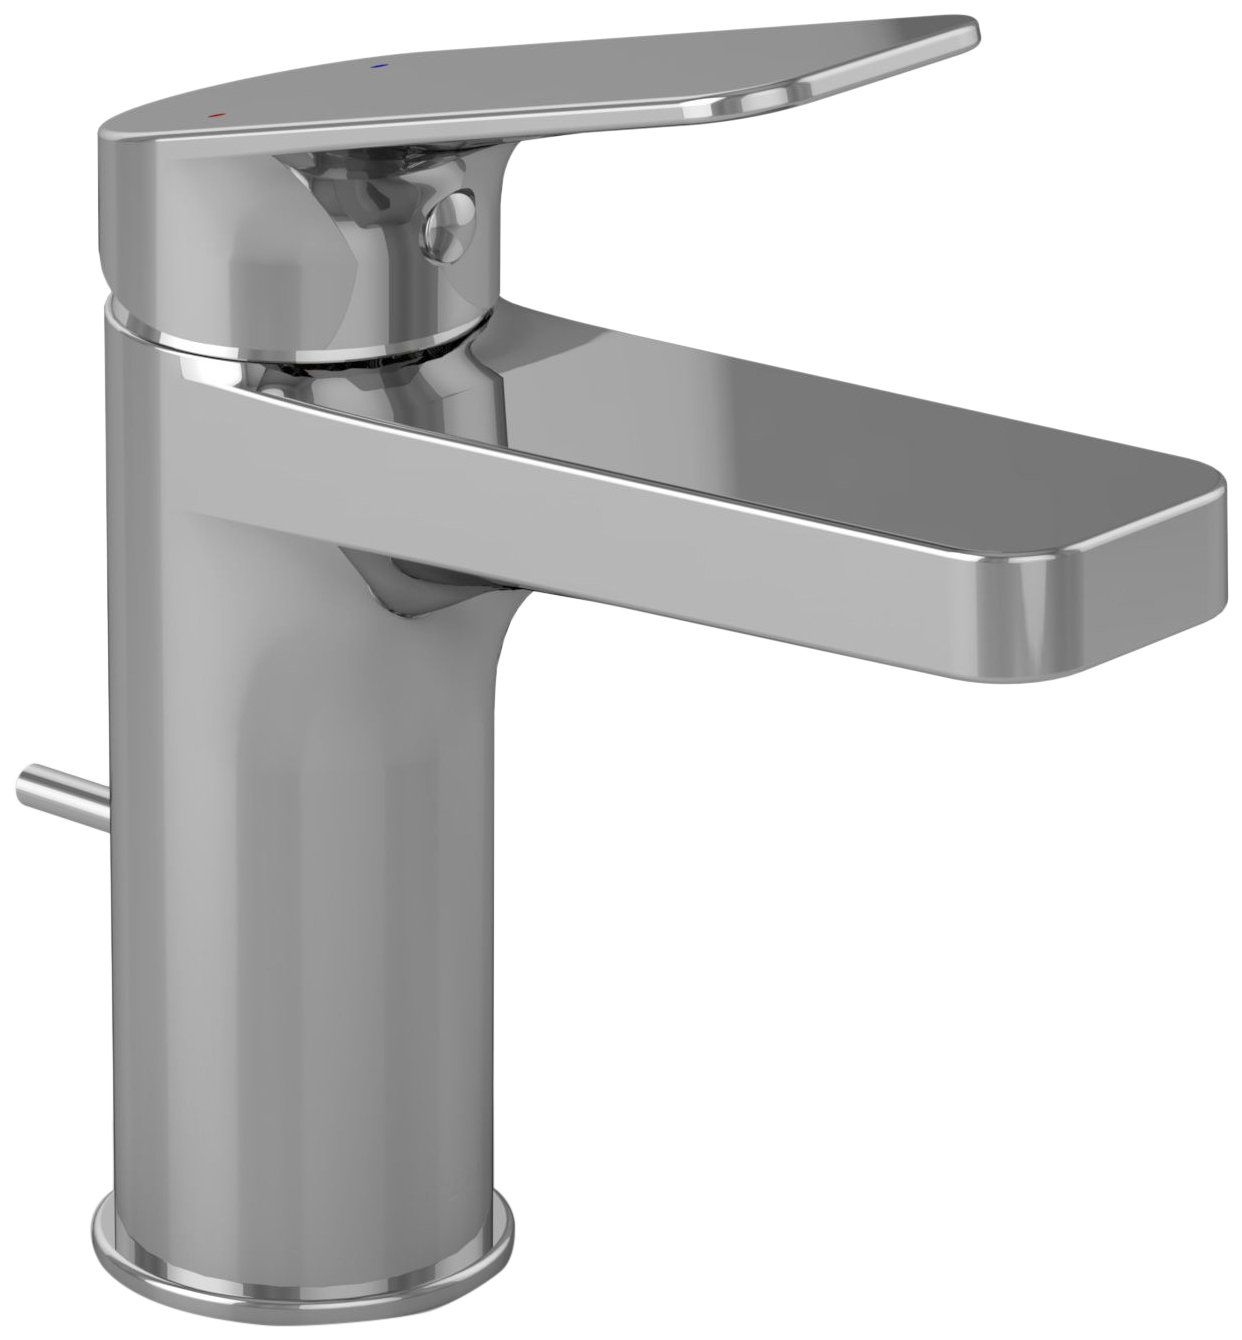 TOTO TL363SD#CP Oberon S Single-Handle Lavatory Faucet, Chrome ...